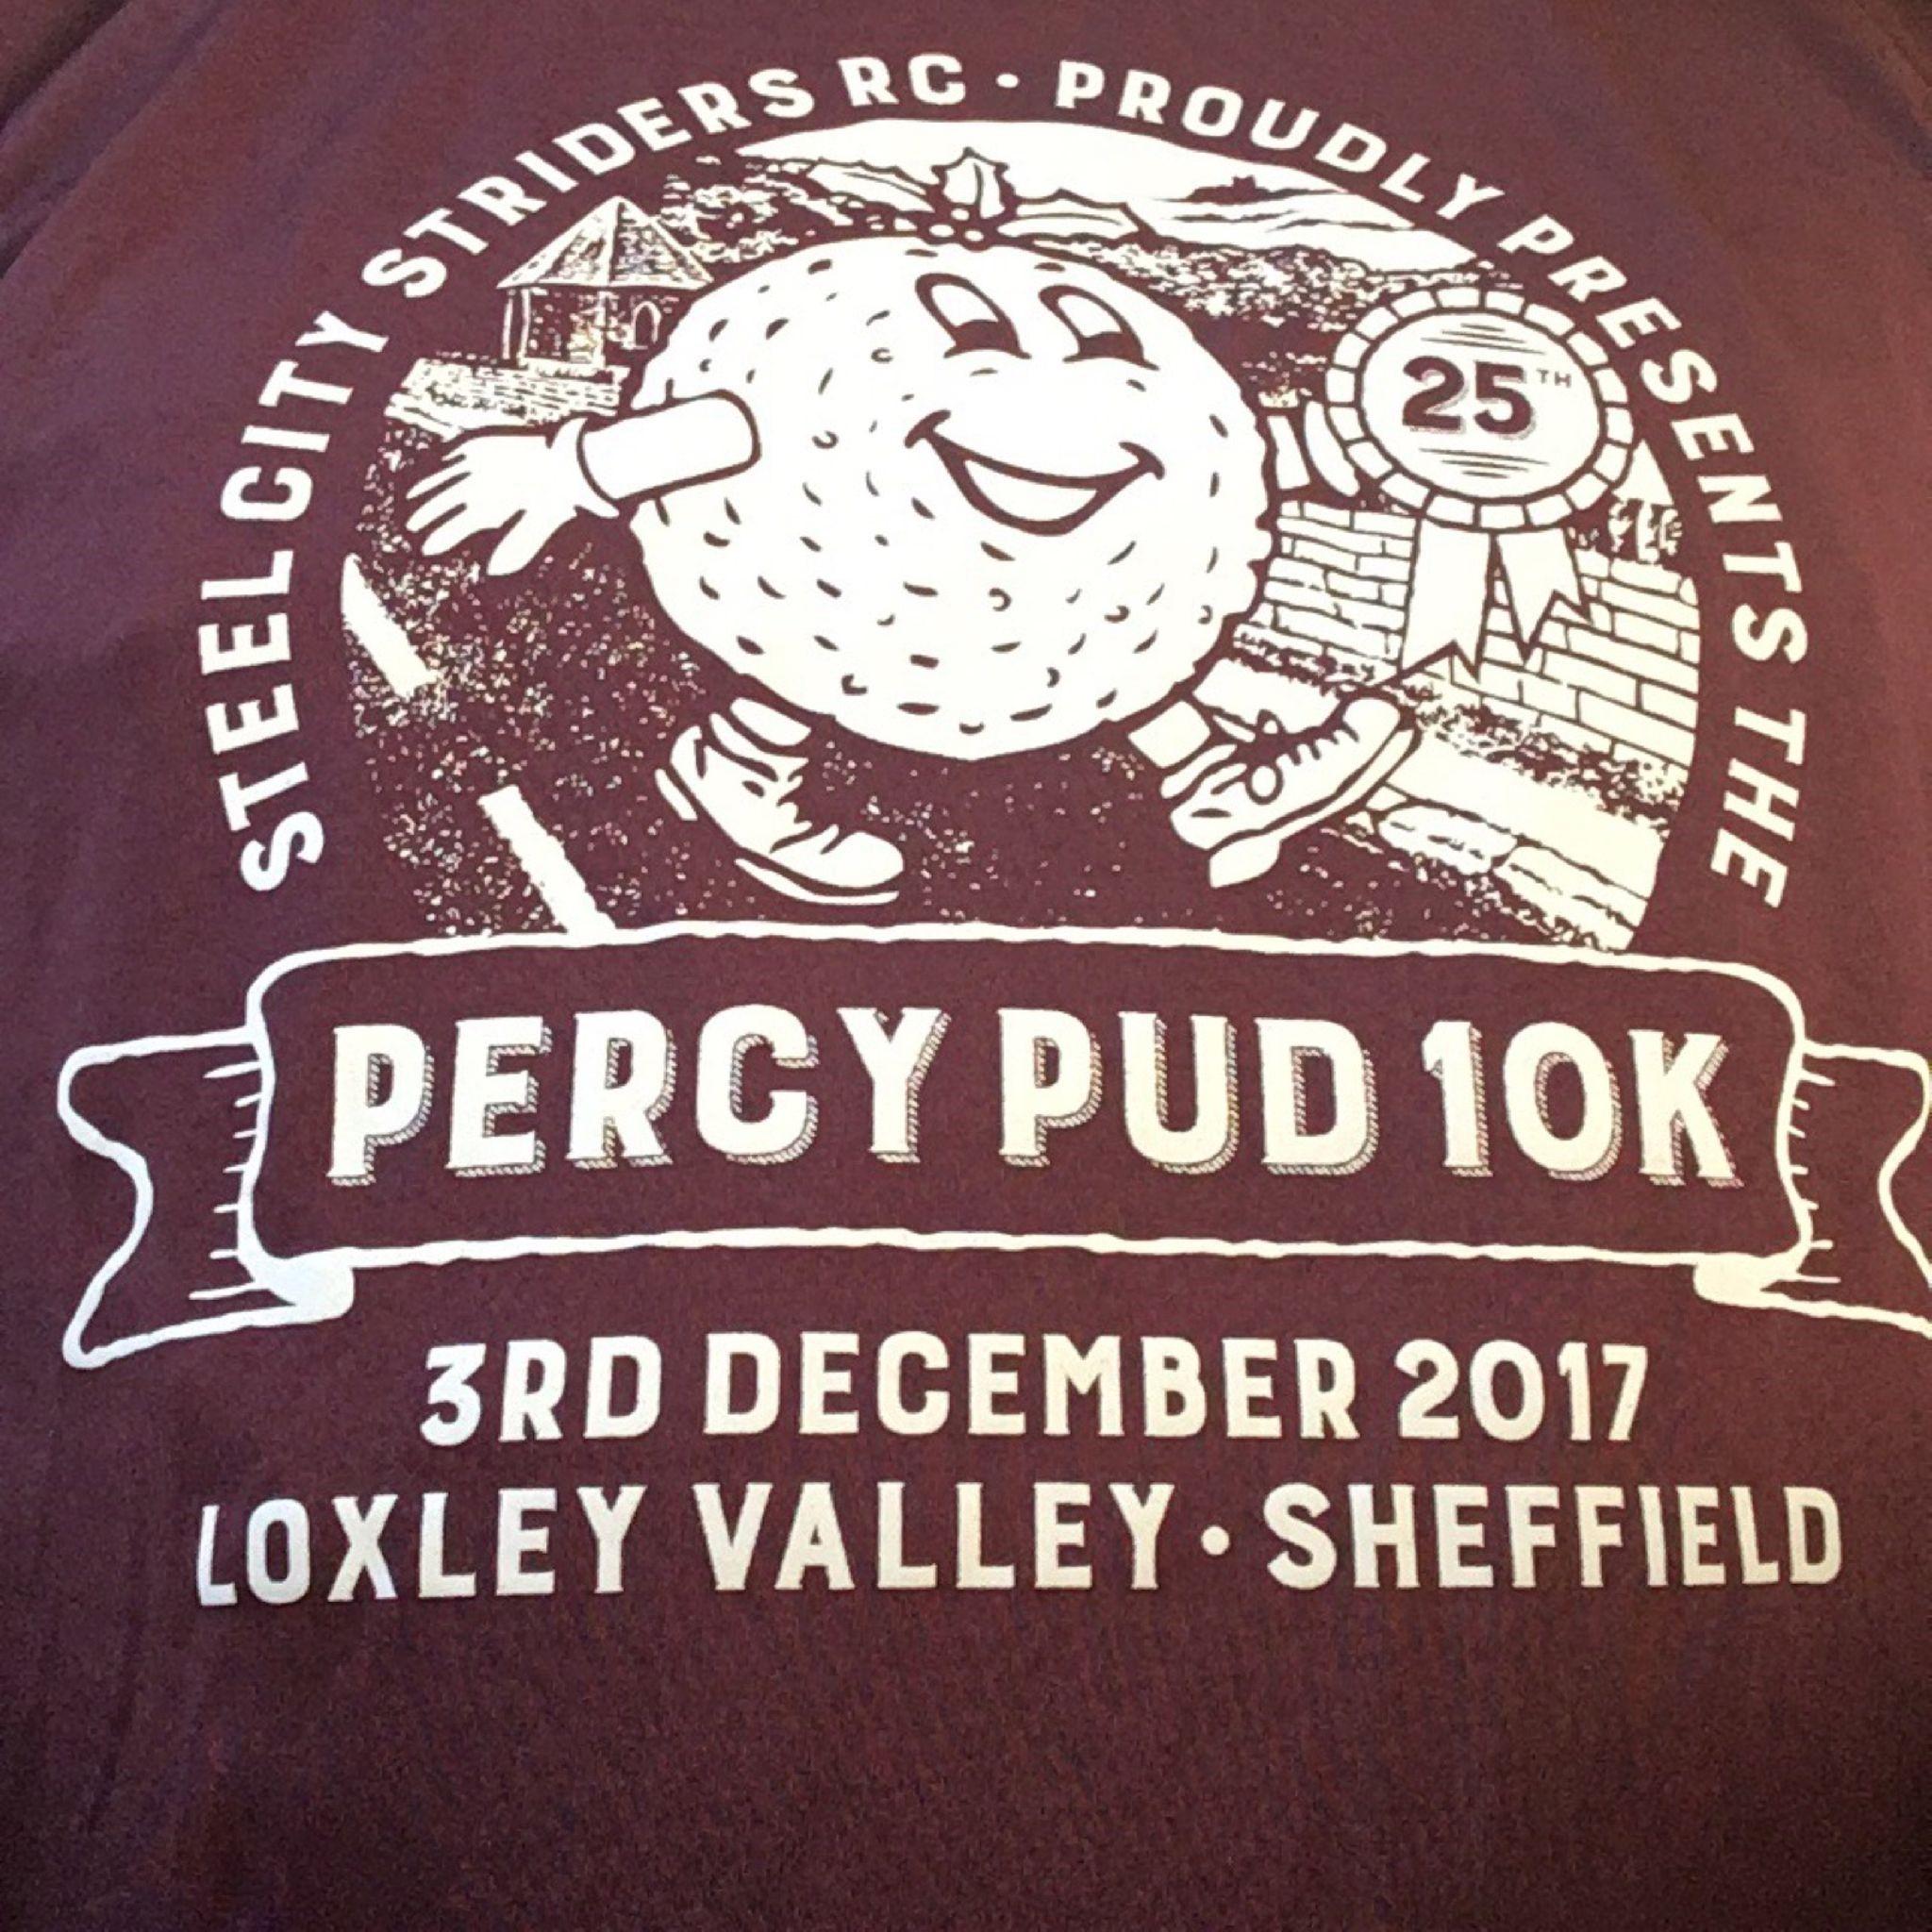 Percy Pud